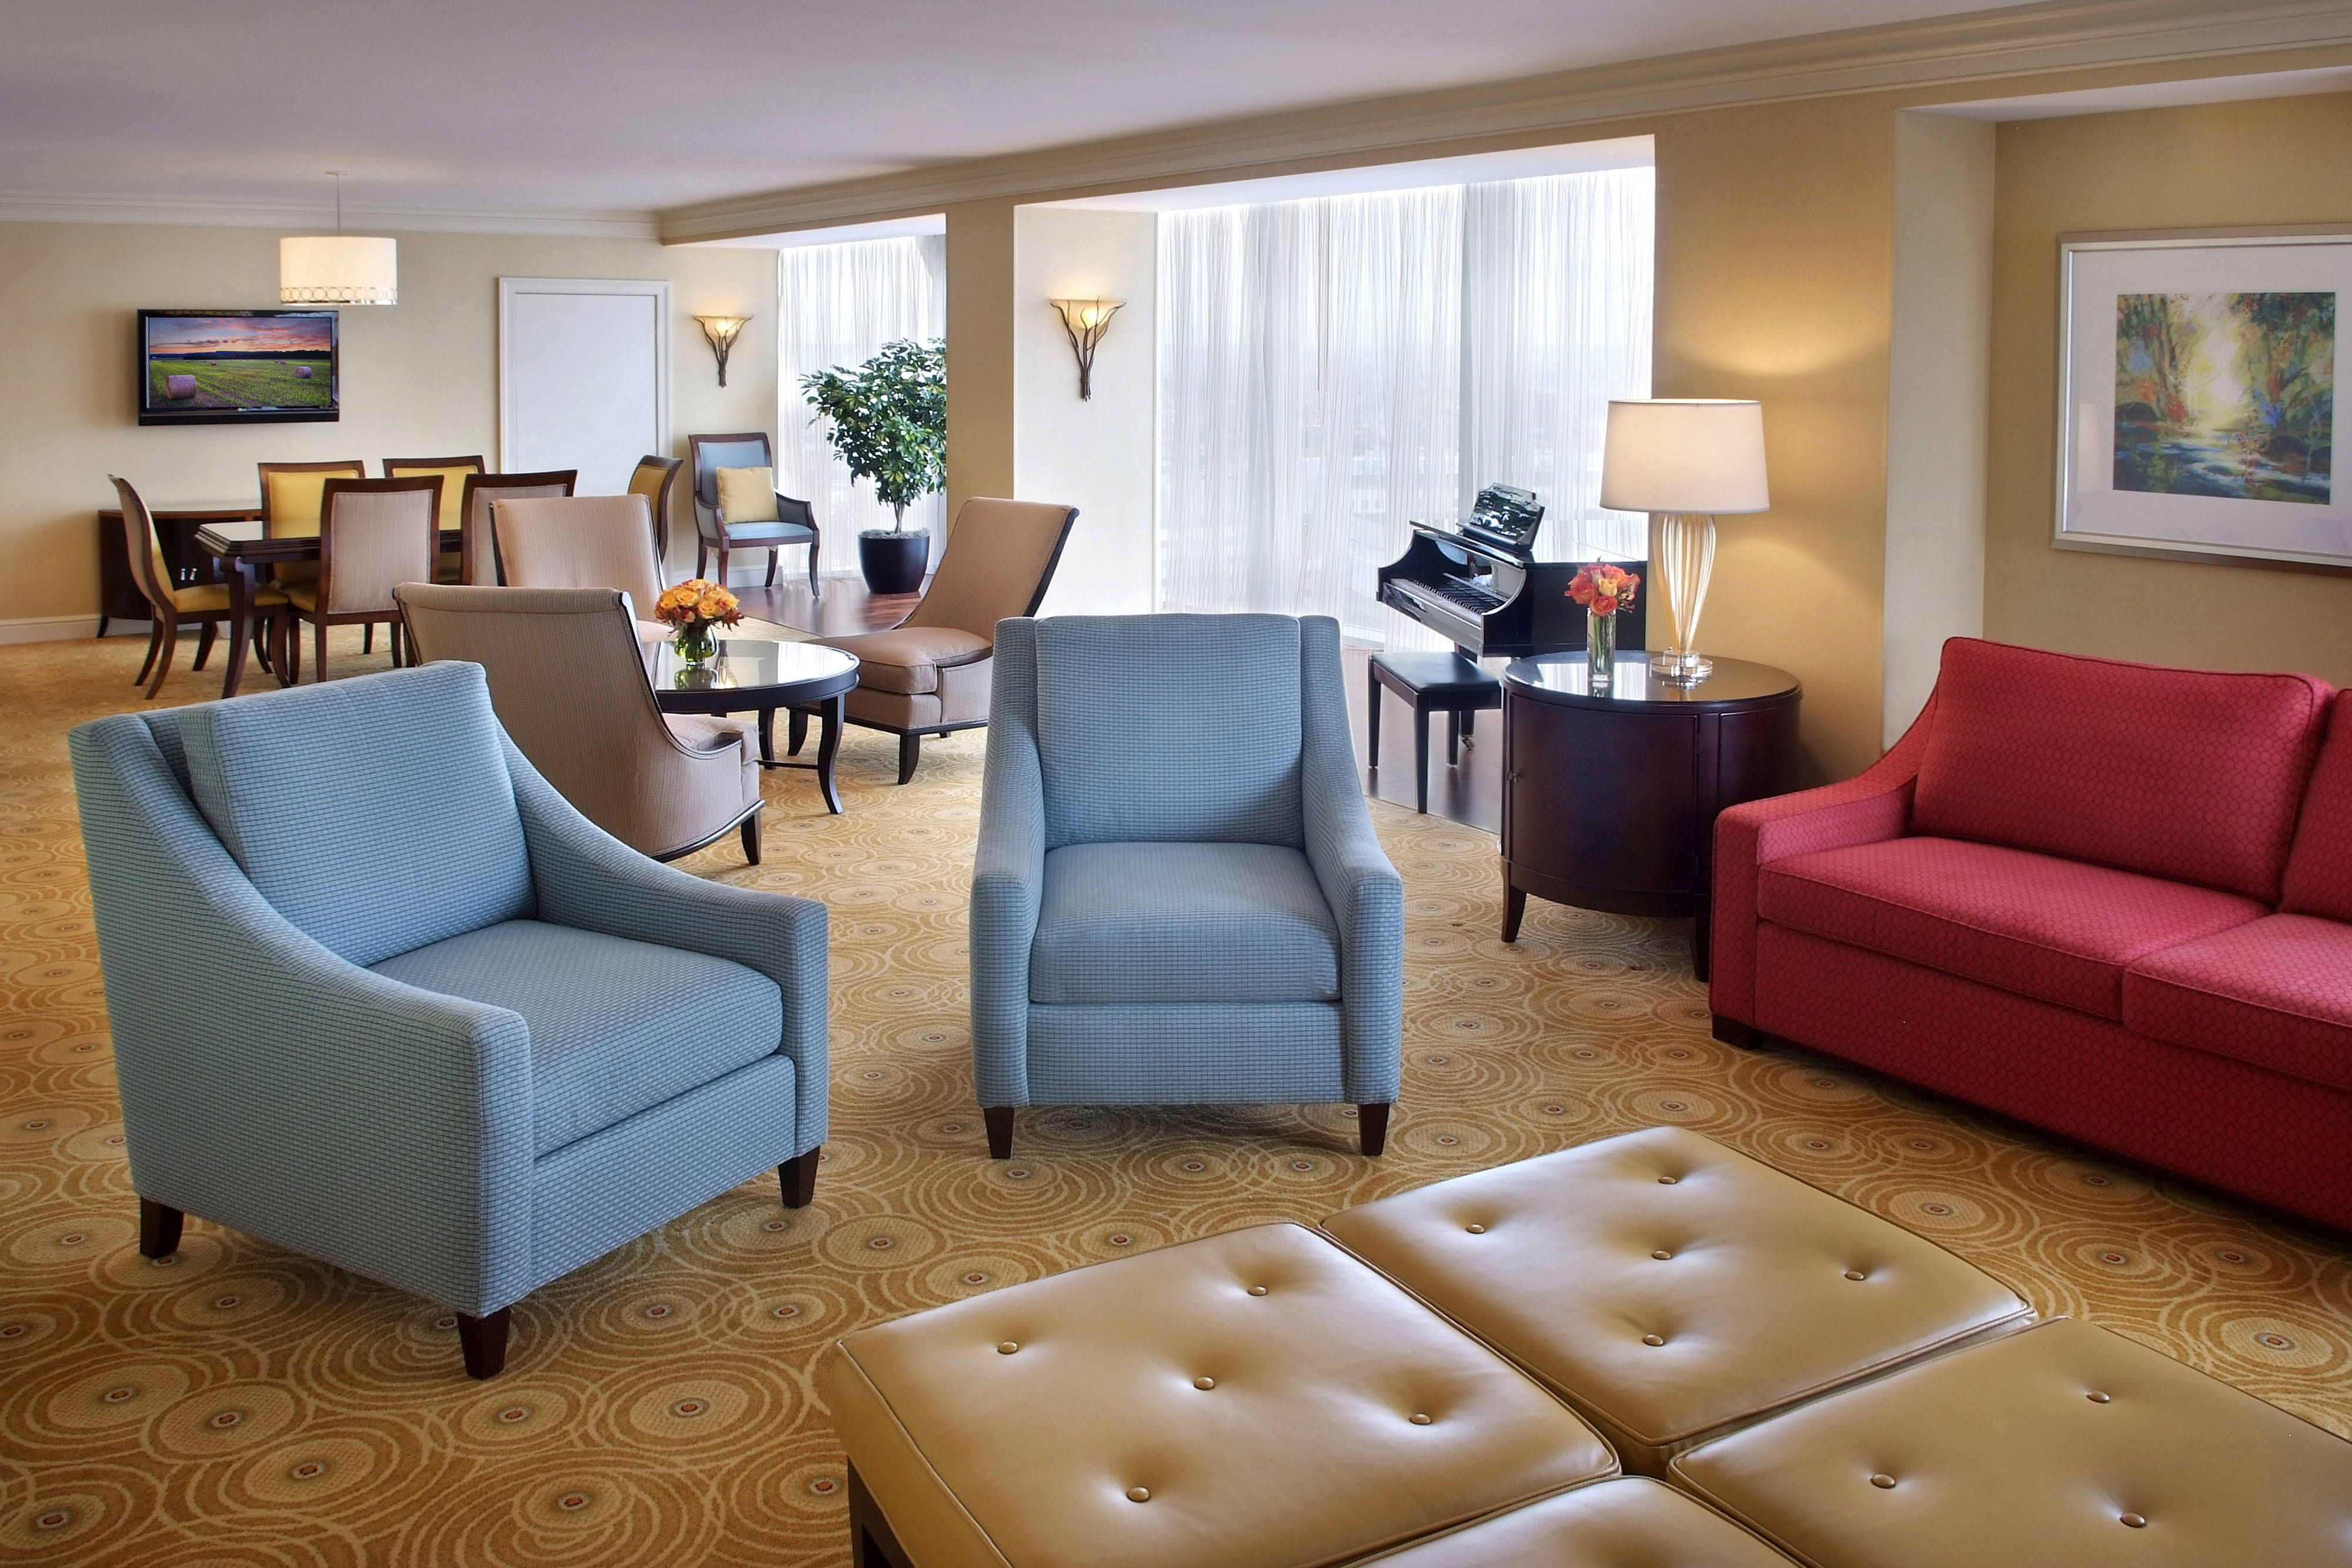 Boston Marriott Cambridge Presidential Suite Living Room Relax Guestroom Travel Home Design Plans House Design Home